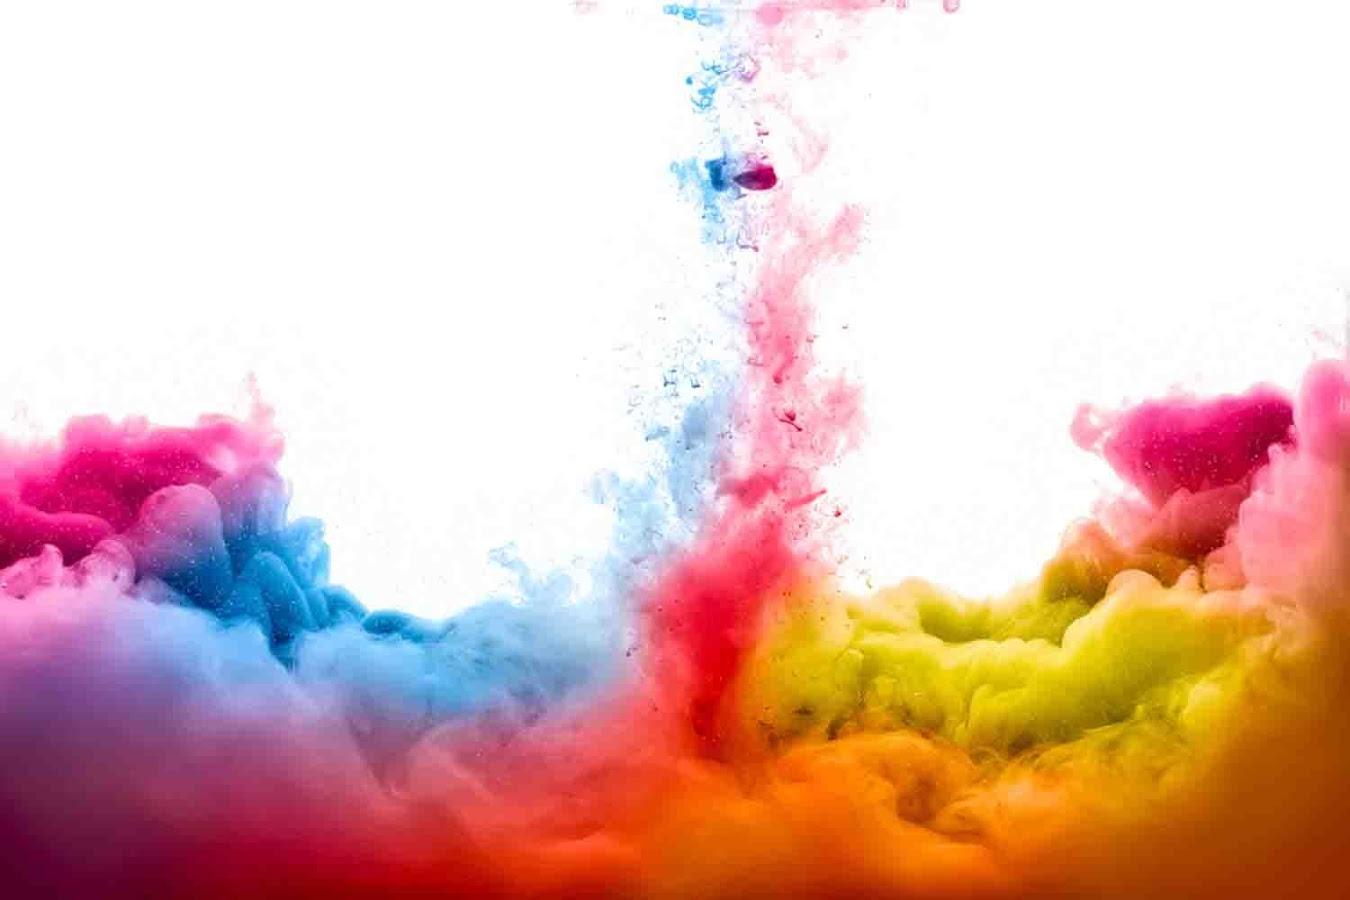 Colorful Paint Liquid Wallpaper